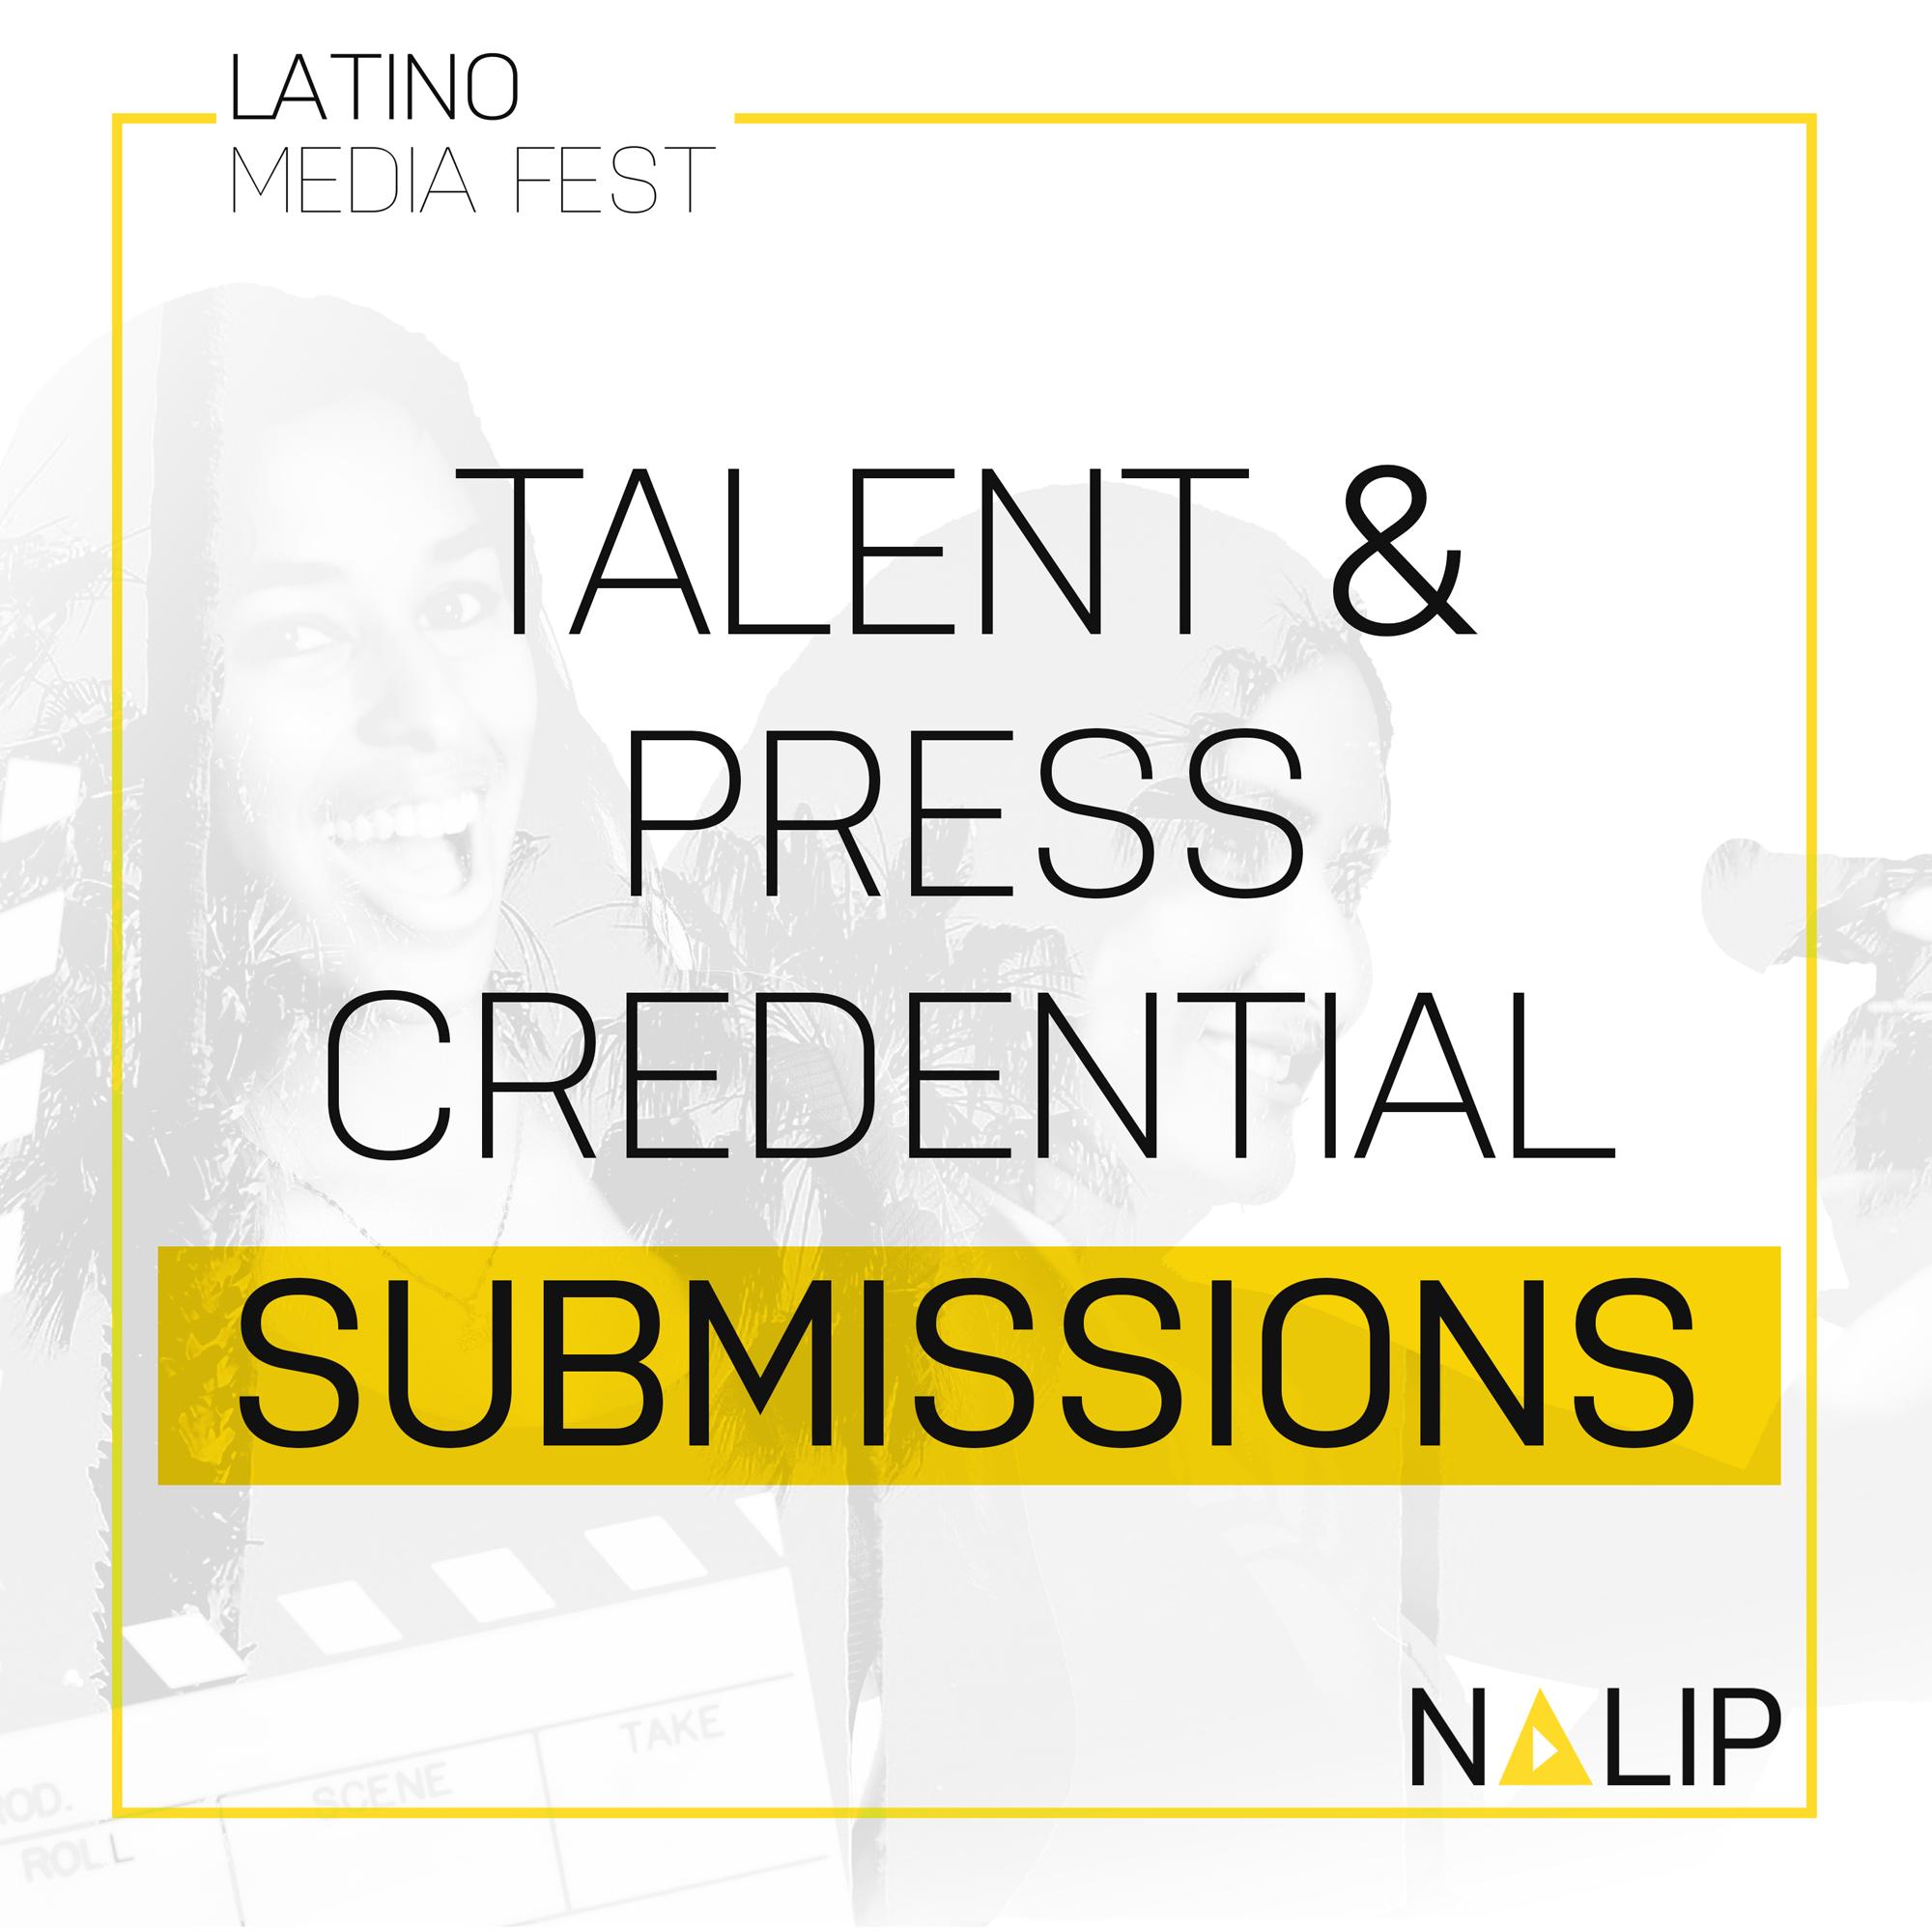 LMF_Talent_Press_Newsletter.png